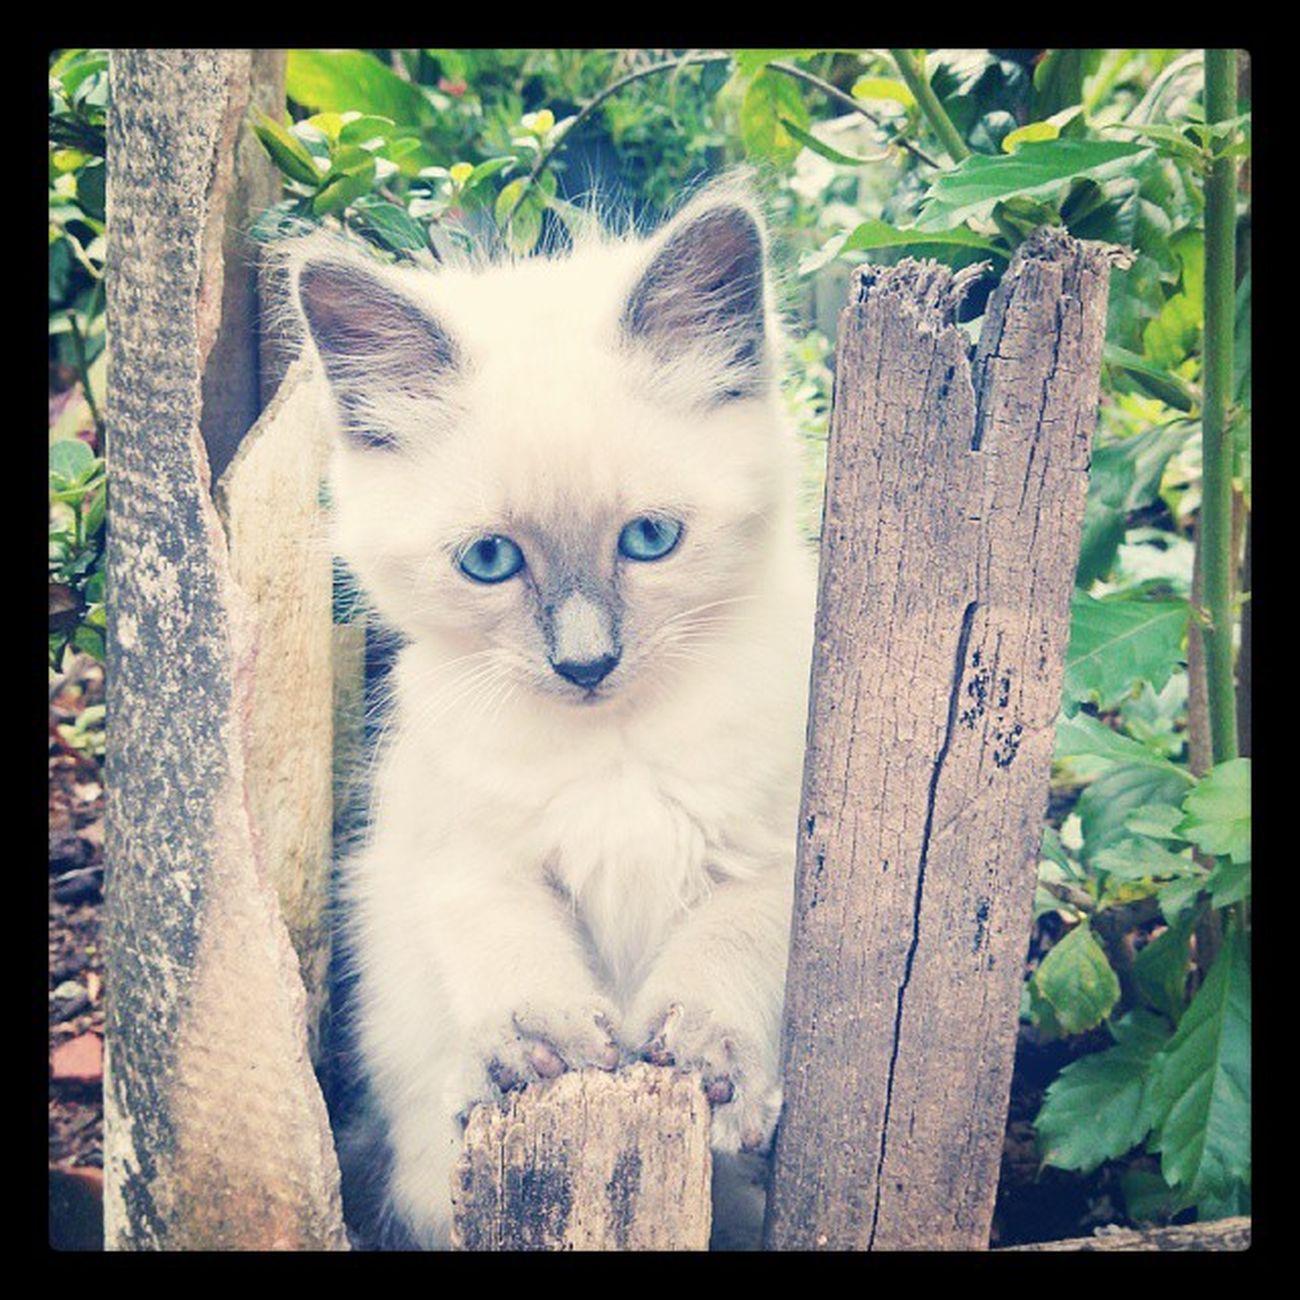 Cat Manhoso Demais!  kkkkk